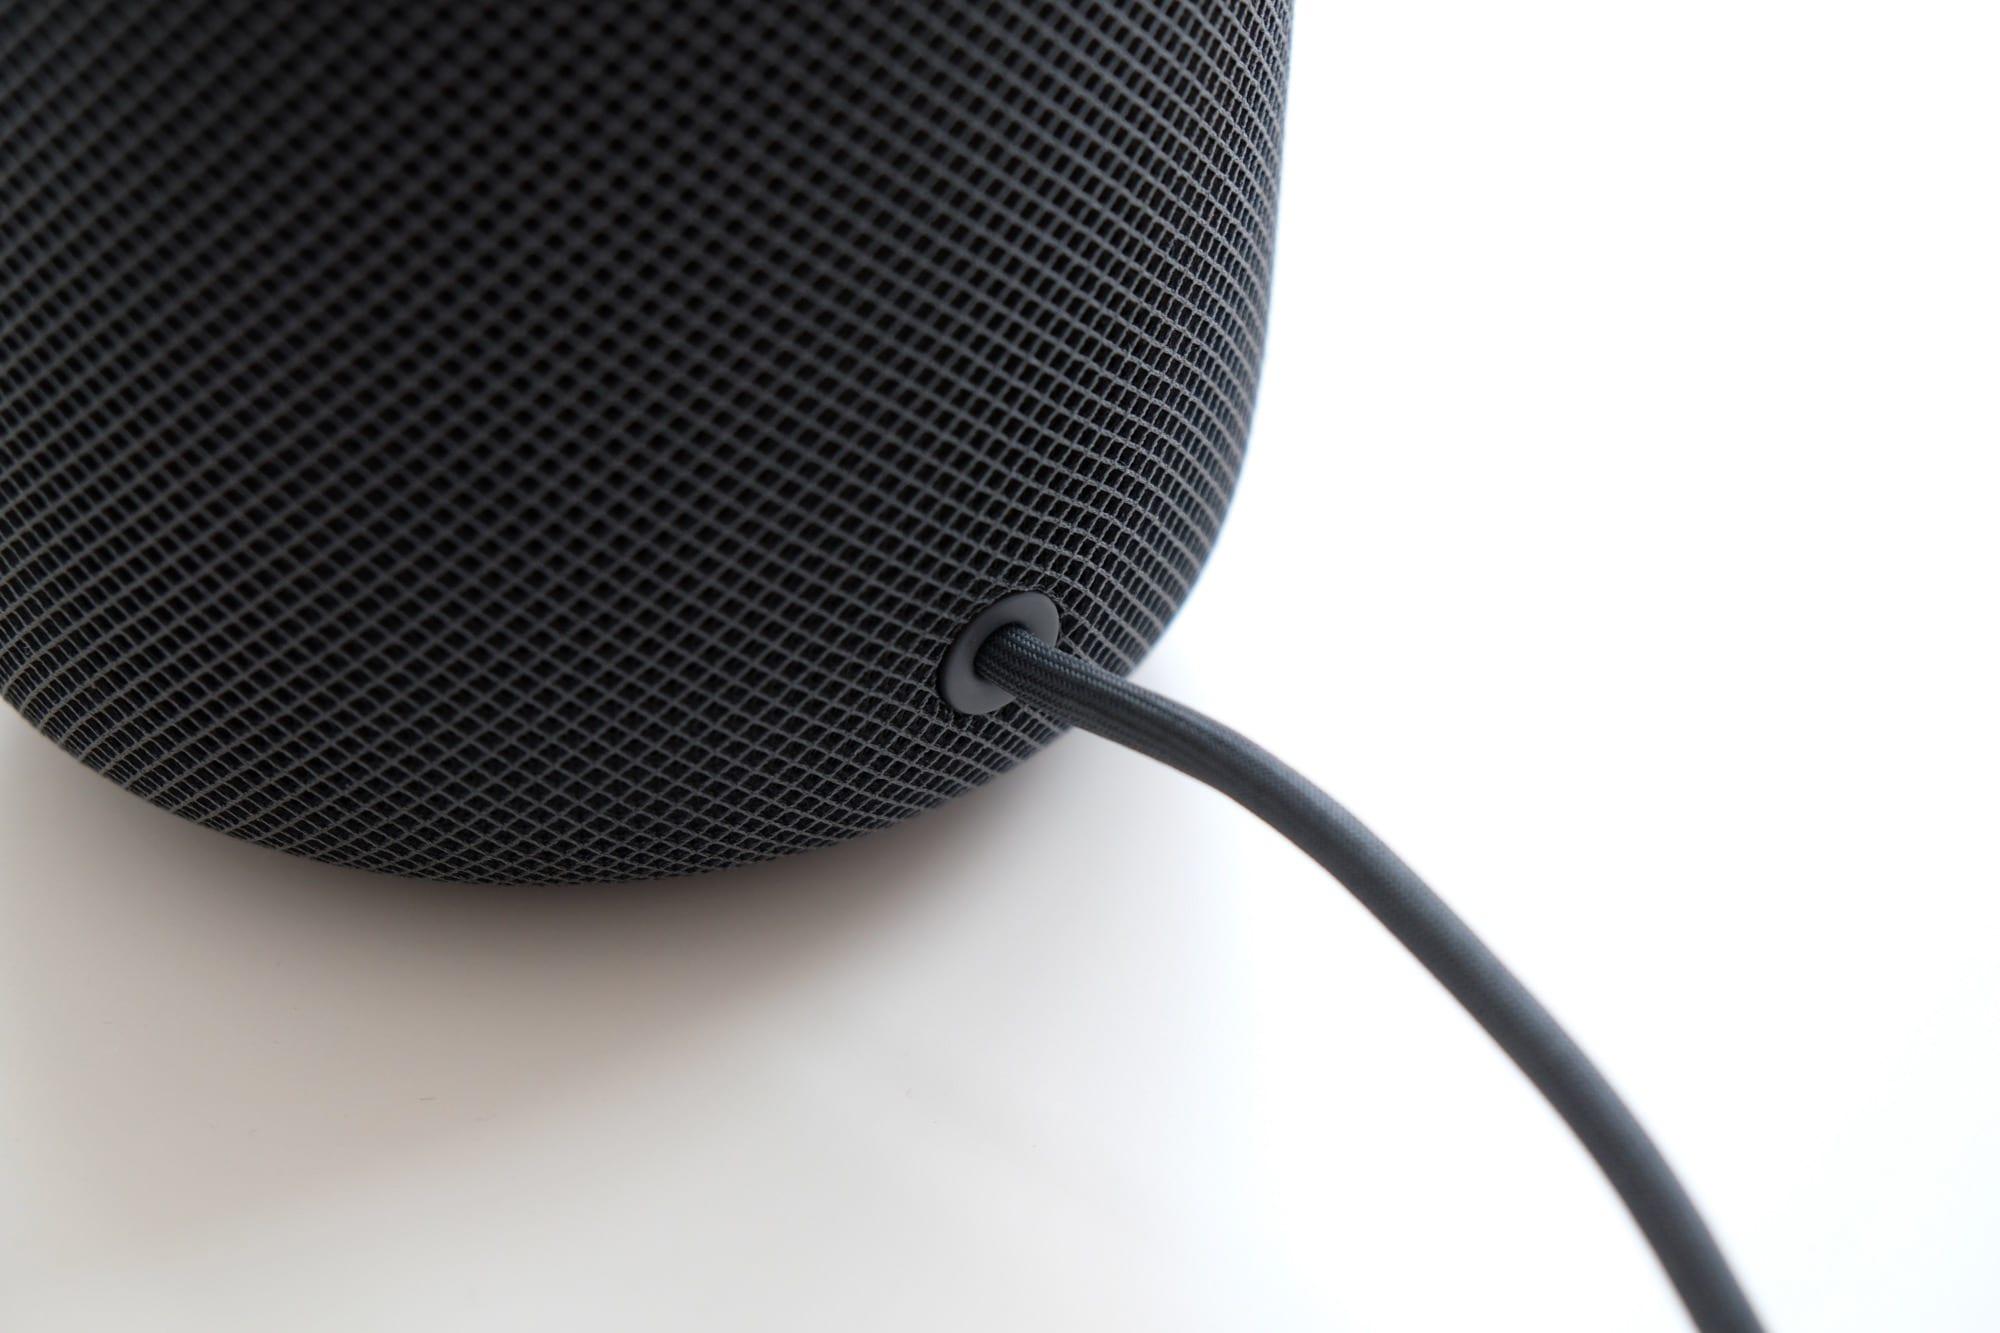 apple homepod recenzia3 - Recenzia: Apple HomePod